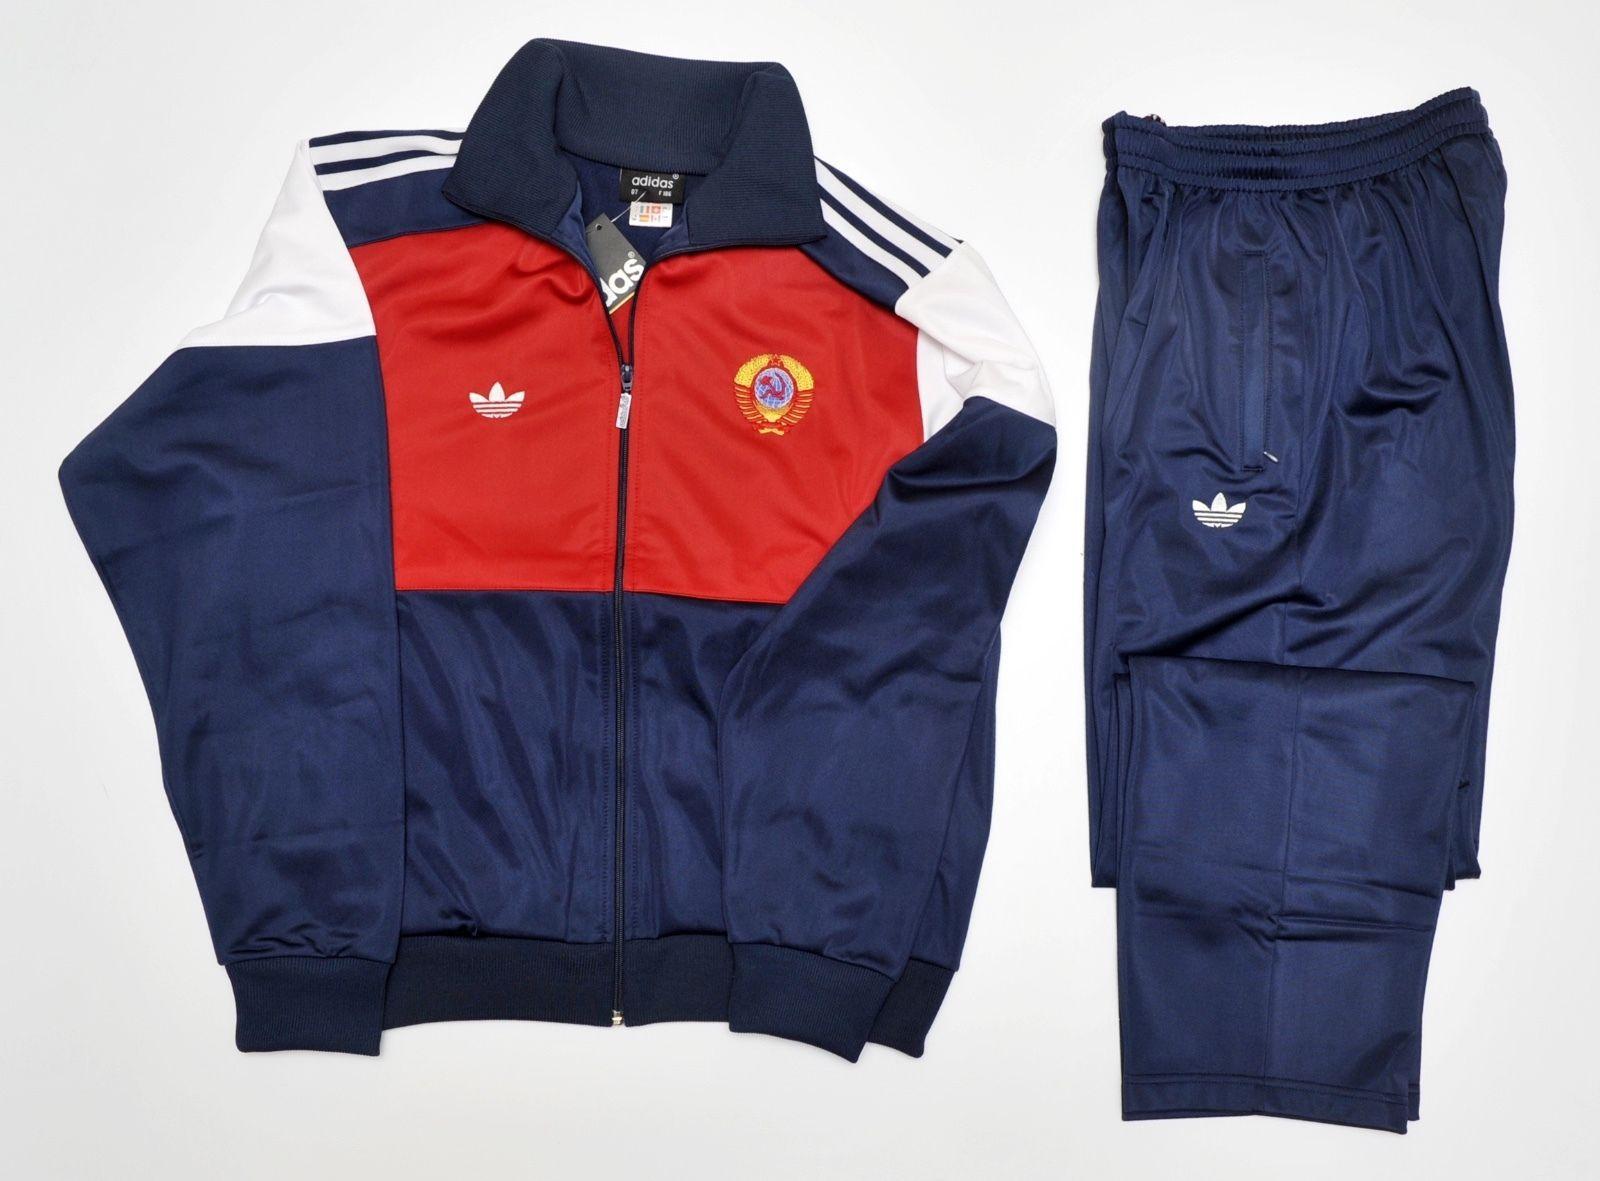 d4e057c58979 Adidas tracksuit new vintage retro old school pants jacket 80 cccp ussr. L  - XL